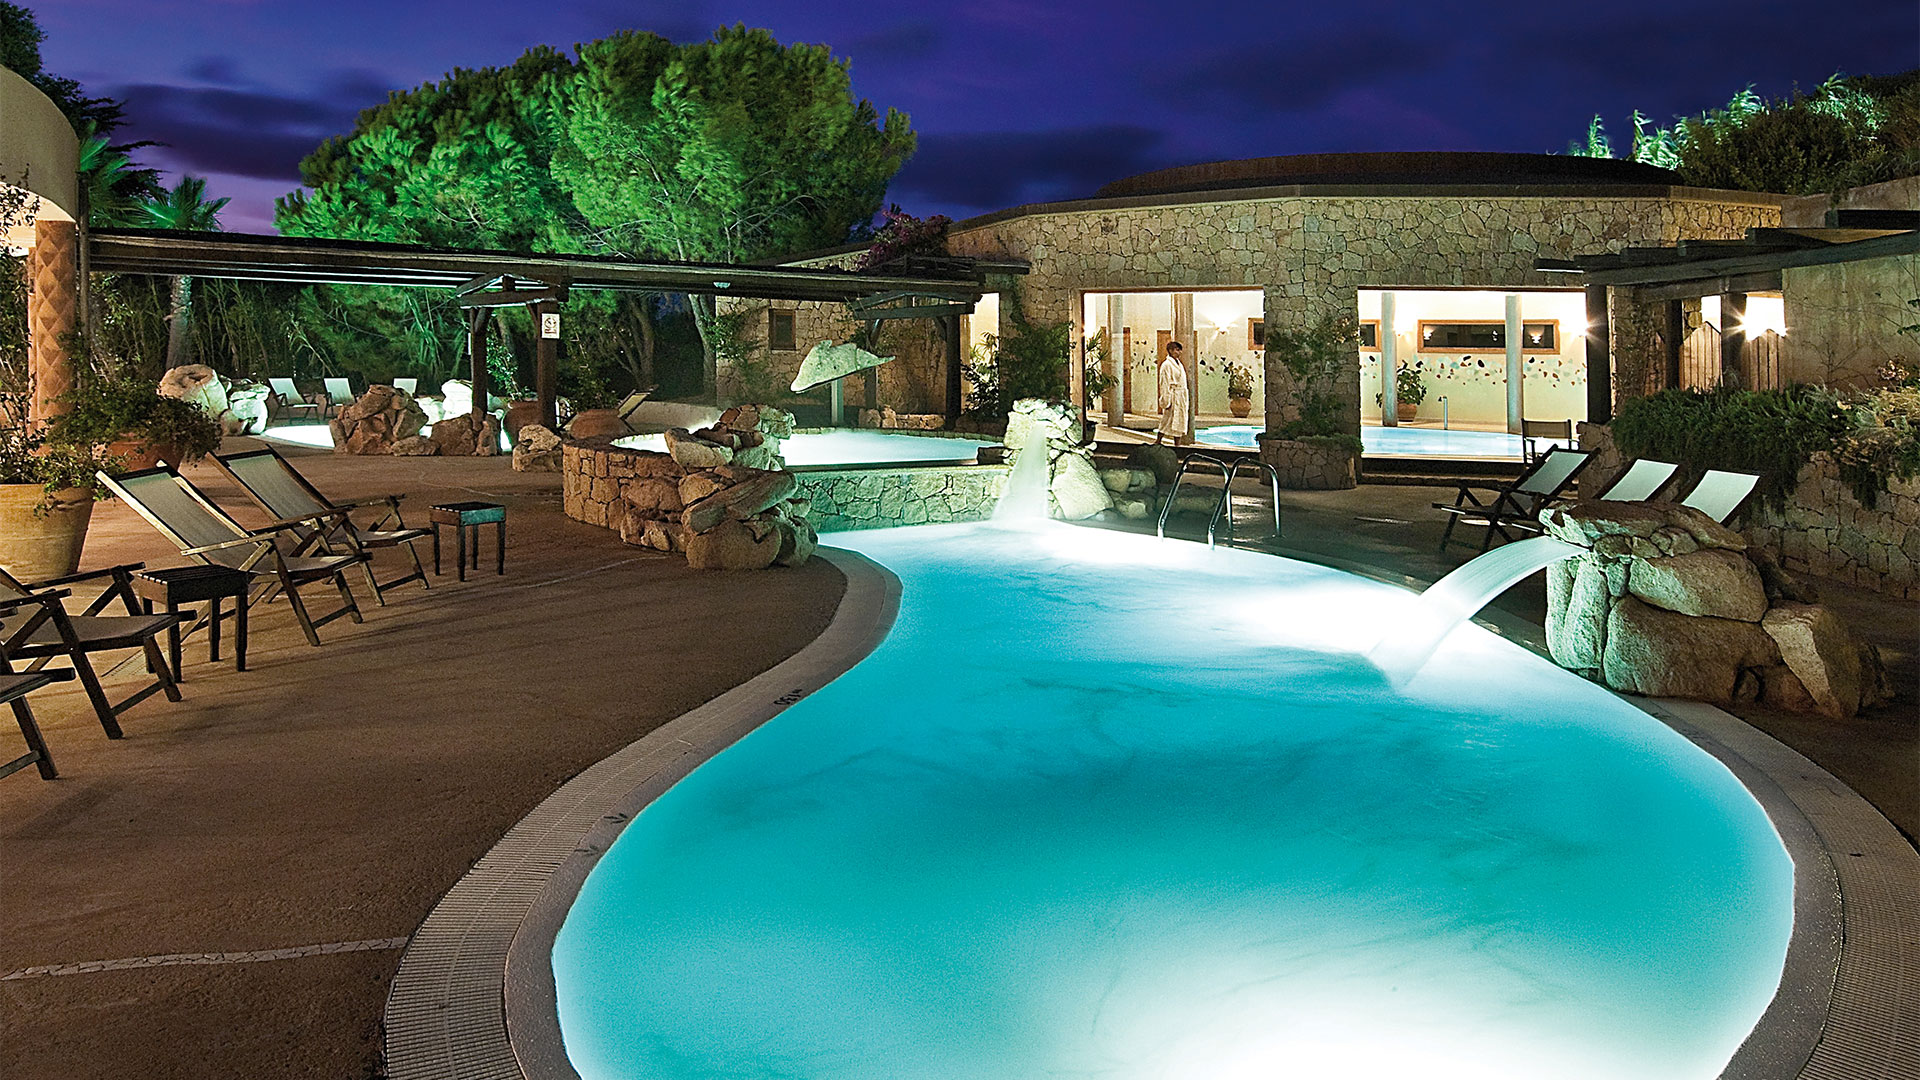 hotel-marinedda-slider-thalasso-piscina-sardegna-isola-rossa-2